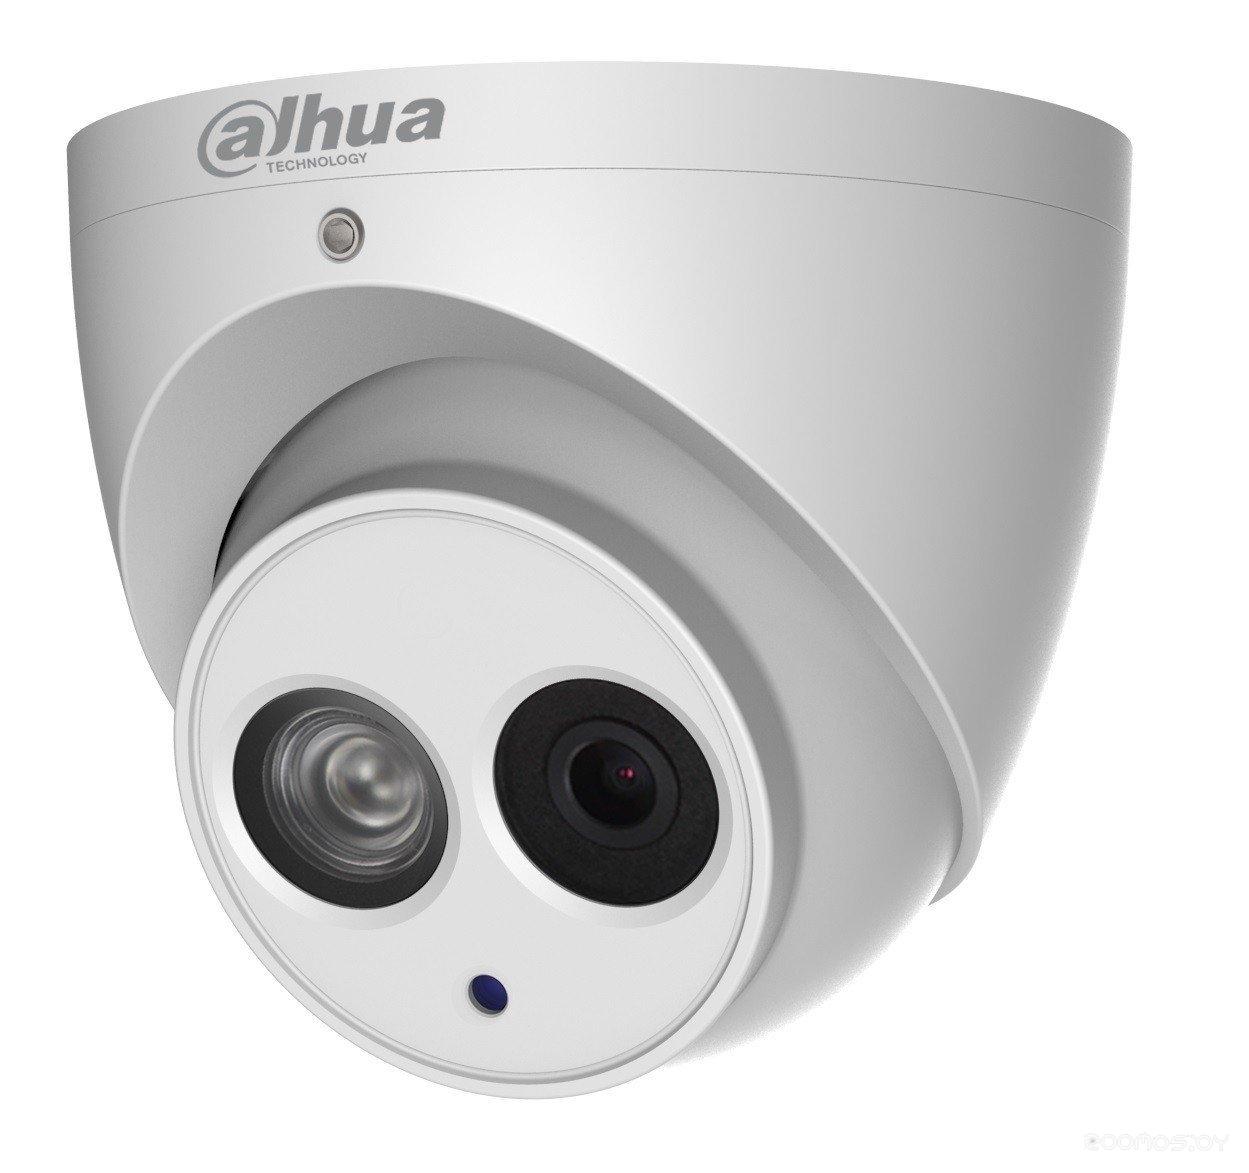 IP-камера Dahua DH-IPC-HDW4431EMP-AS-0360B-S2